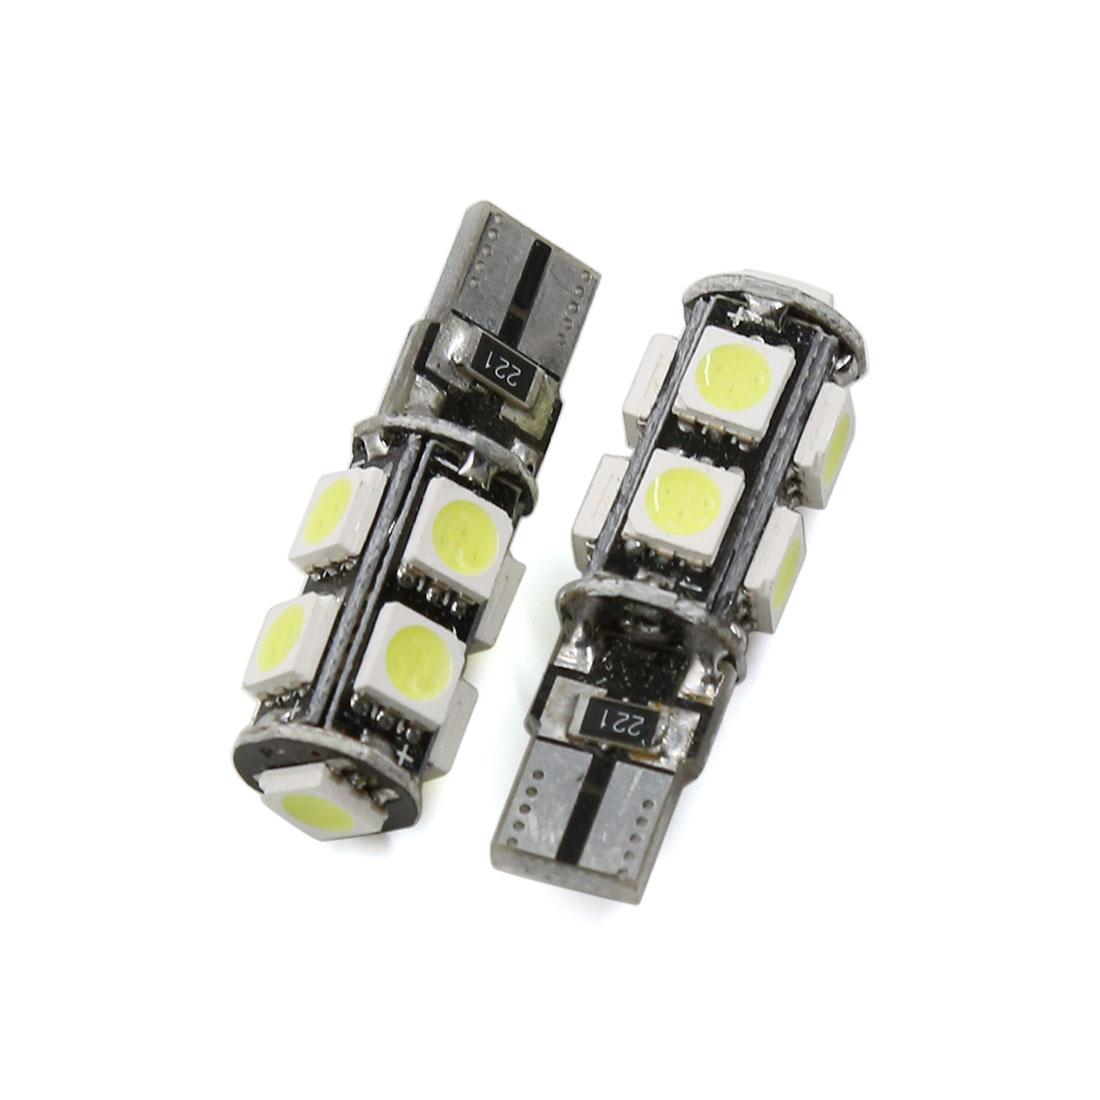 2 Pcs No Free T10 9 LED 5050 SMD White Car Side Wedge Light Bulb DC 12V Interior